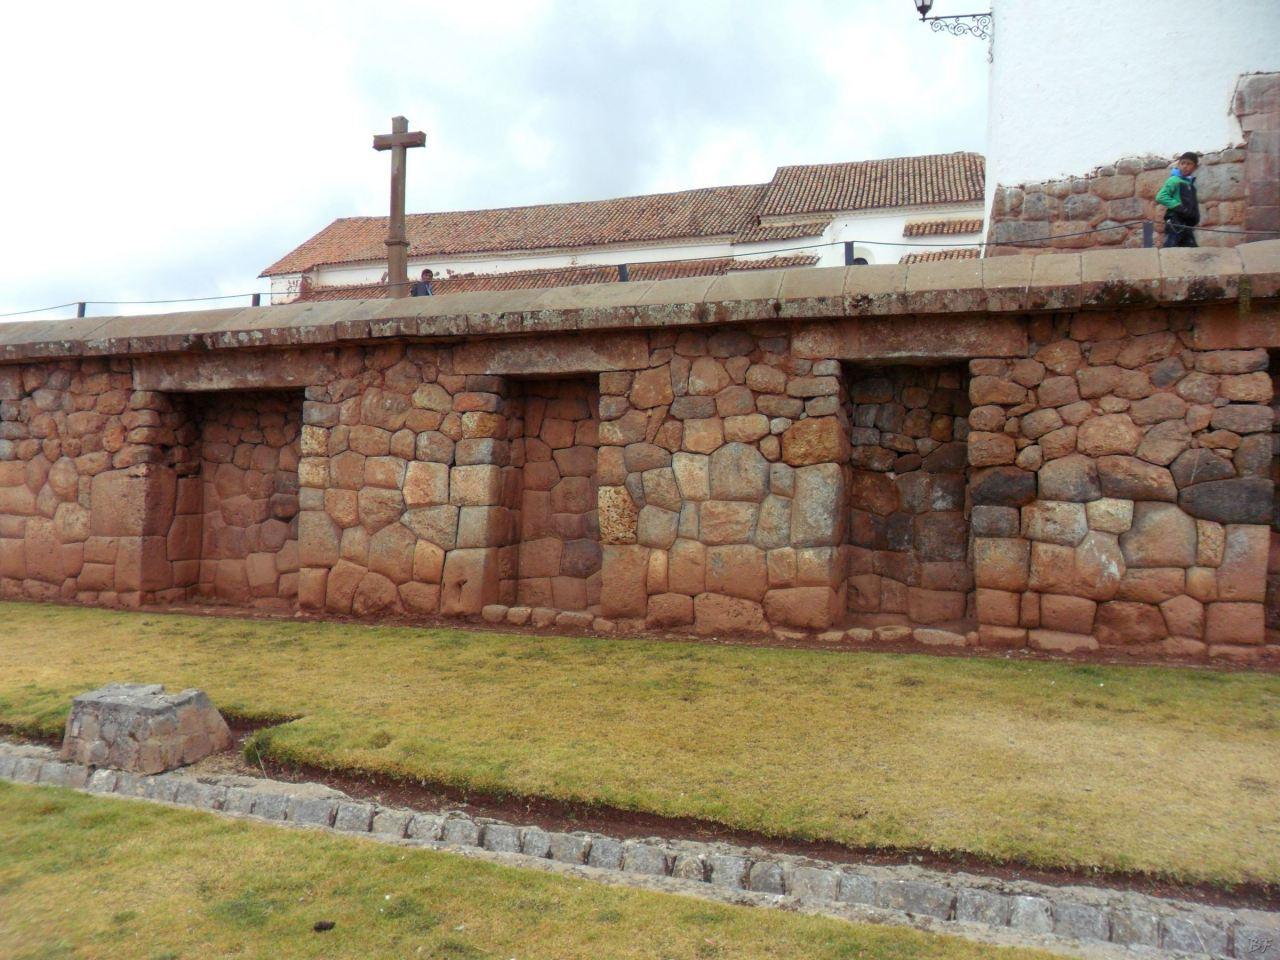 Chinchero-Mura-Poligonali-Piramide-Urubamba-Peru-18